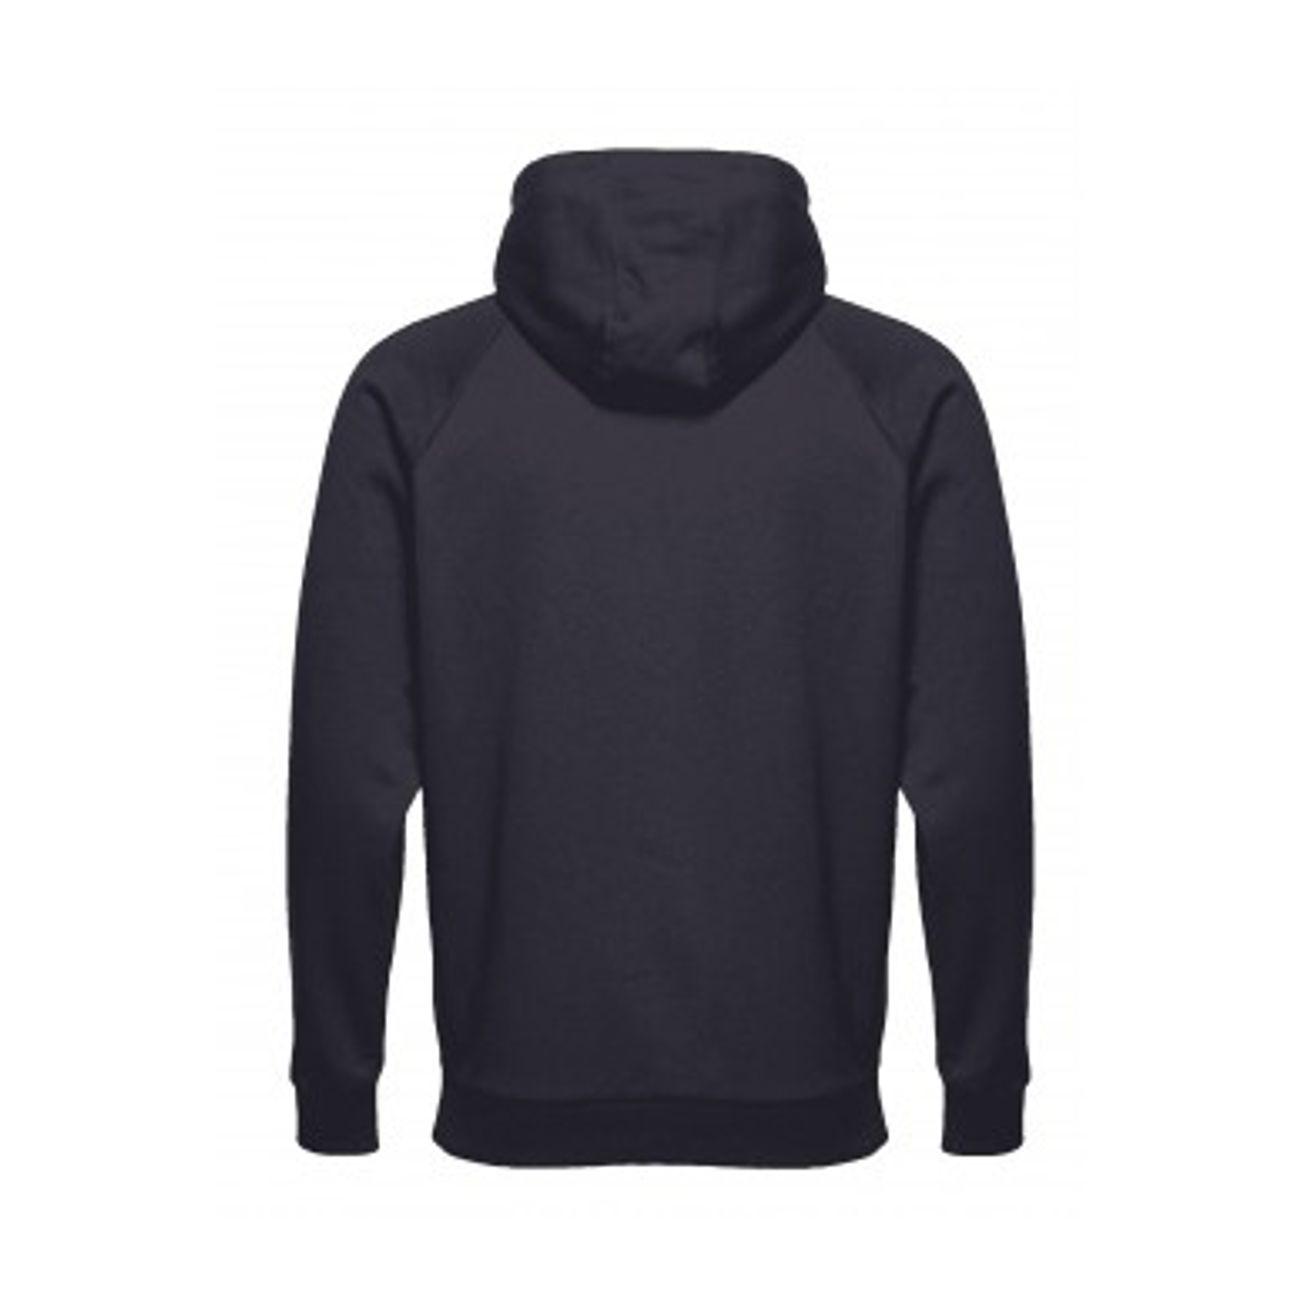 Mode- Lifestyle homme UNDER ARMOUR Sweat Under Armour Rival Fleece Logo - 1345628-001